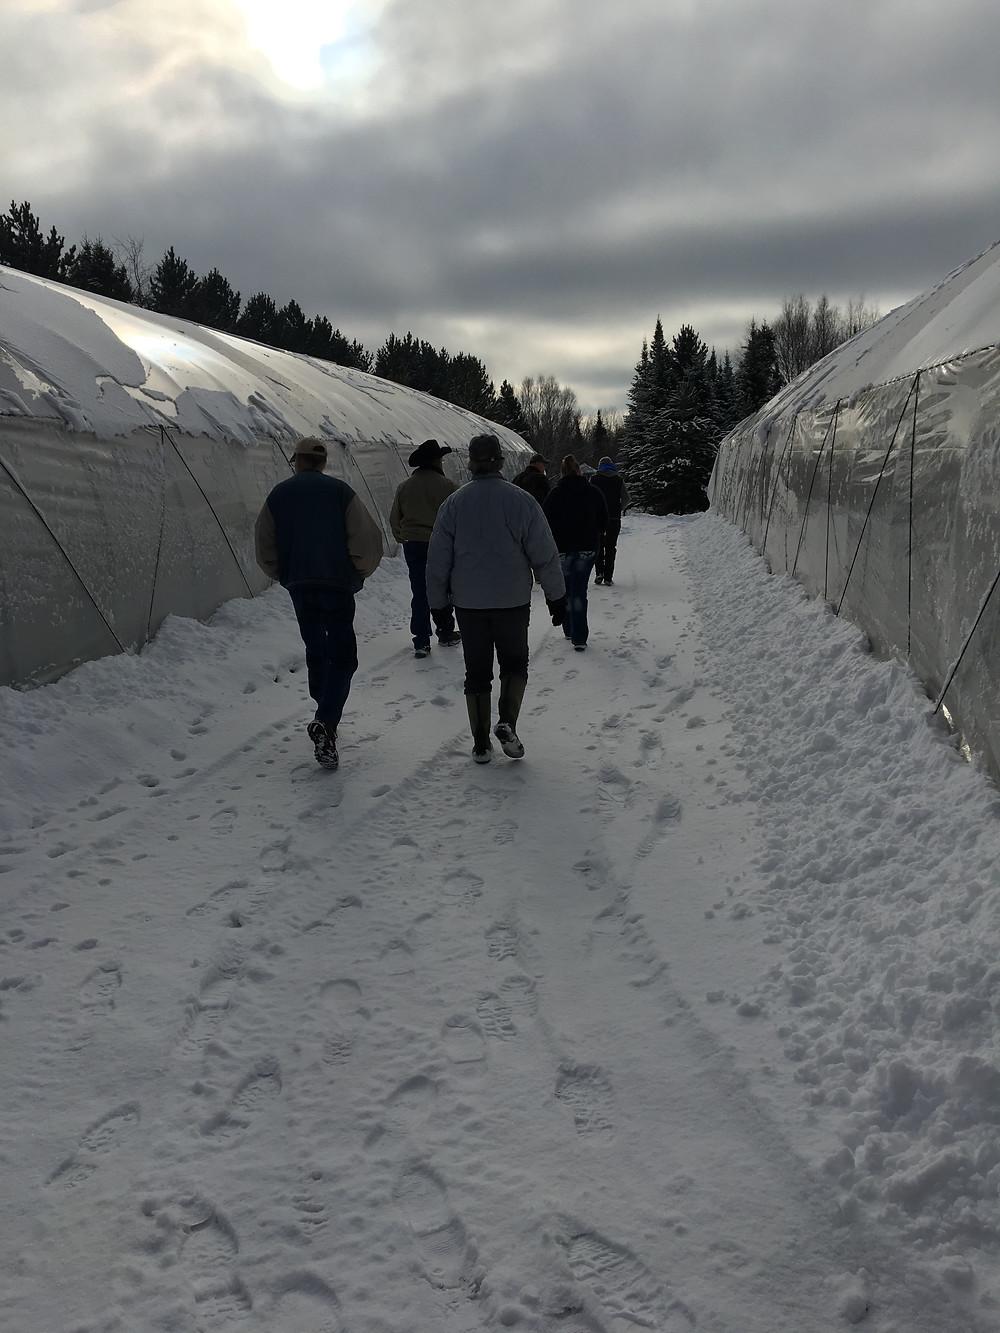 Walking between winter growing tunnels